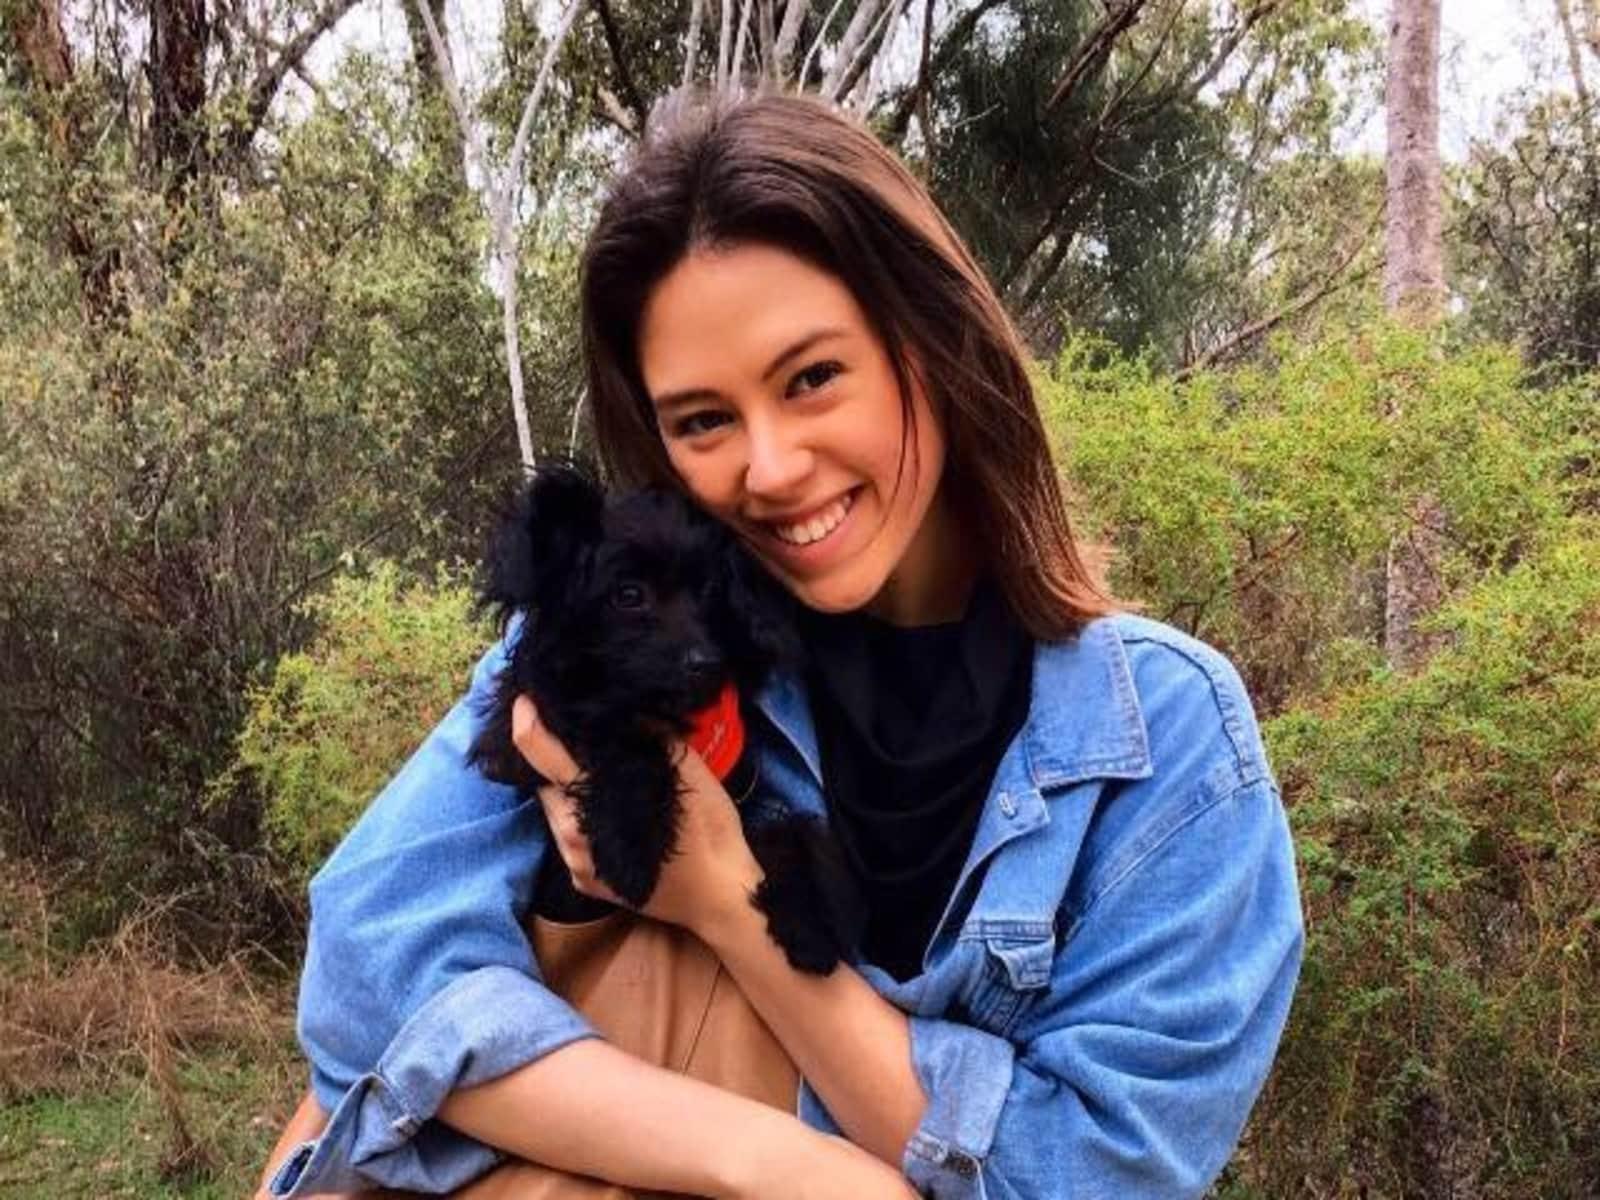 Sophie olivia from Perth, Western Australia, Australia